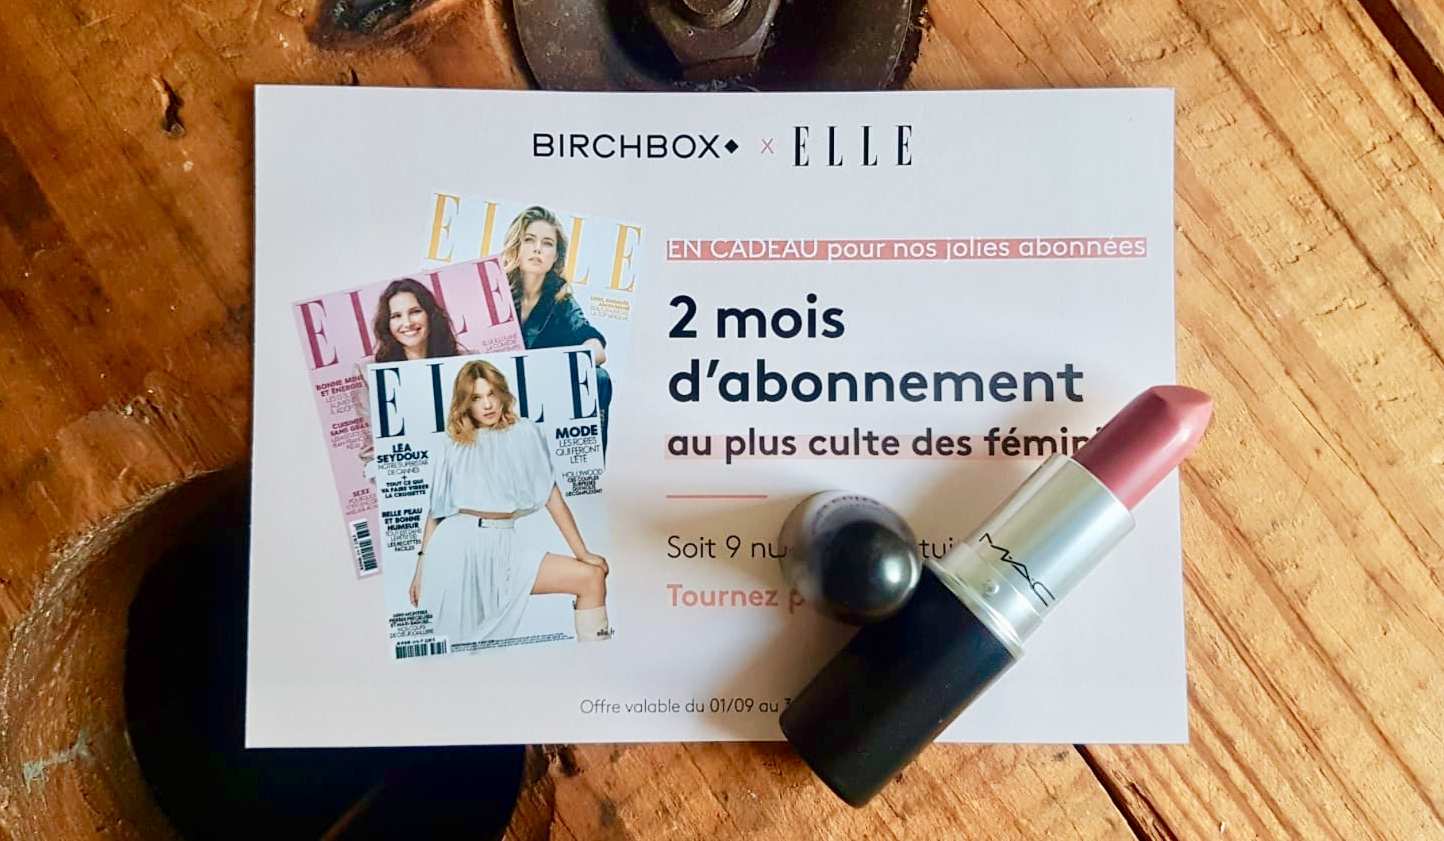 Birchbox X Elle - MAC